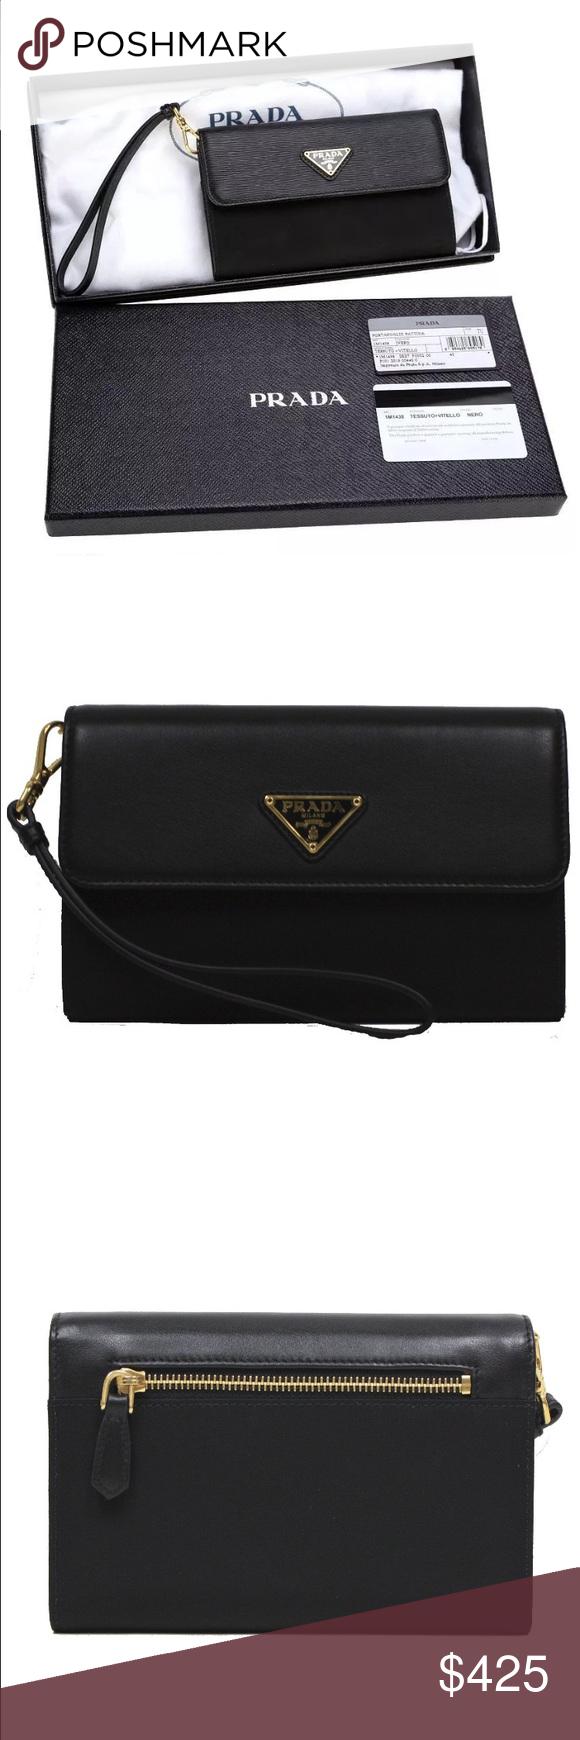 f21fb9e6f1f027 NWT Prada wristlet wallet NEW WITH TAG AUTHENTICITY CARD AND BOX PRADA  MILANO LADIES CLUTCH BAG